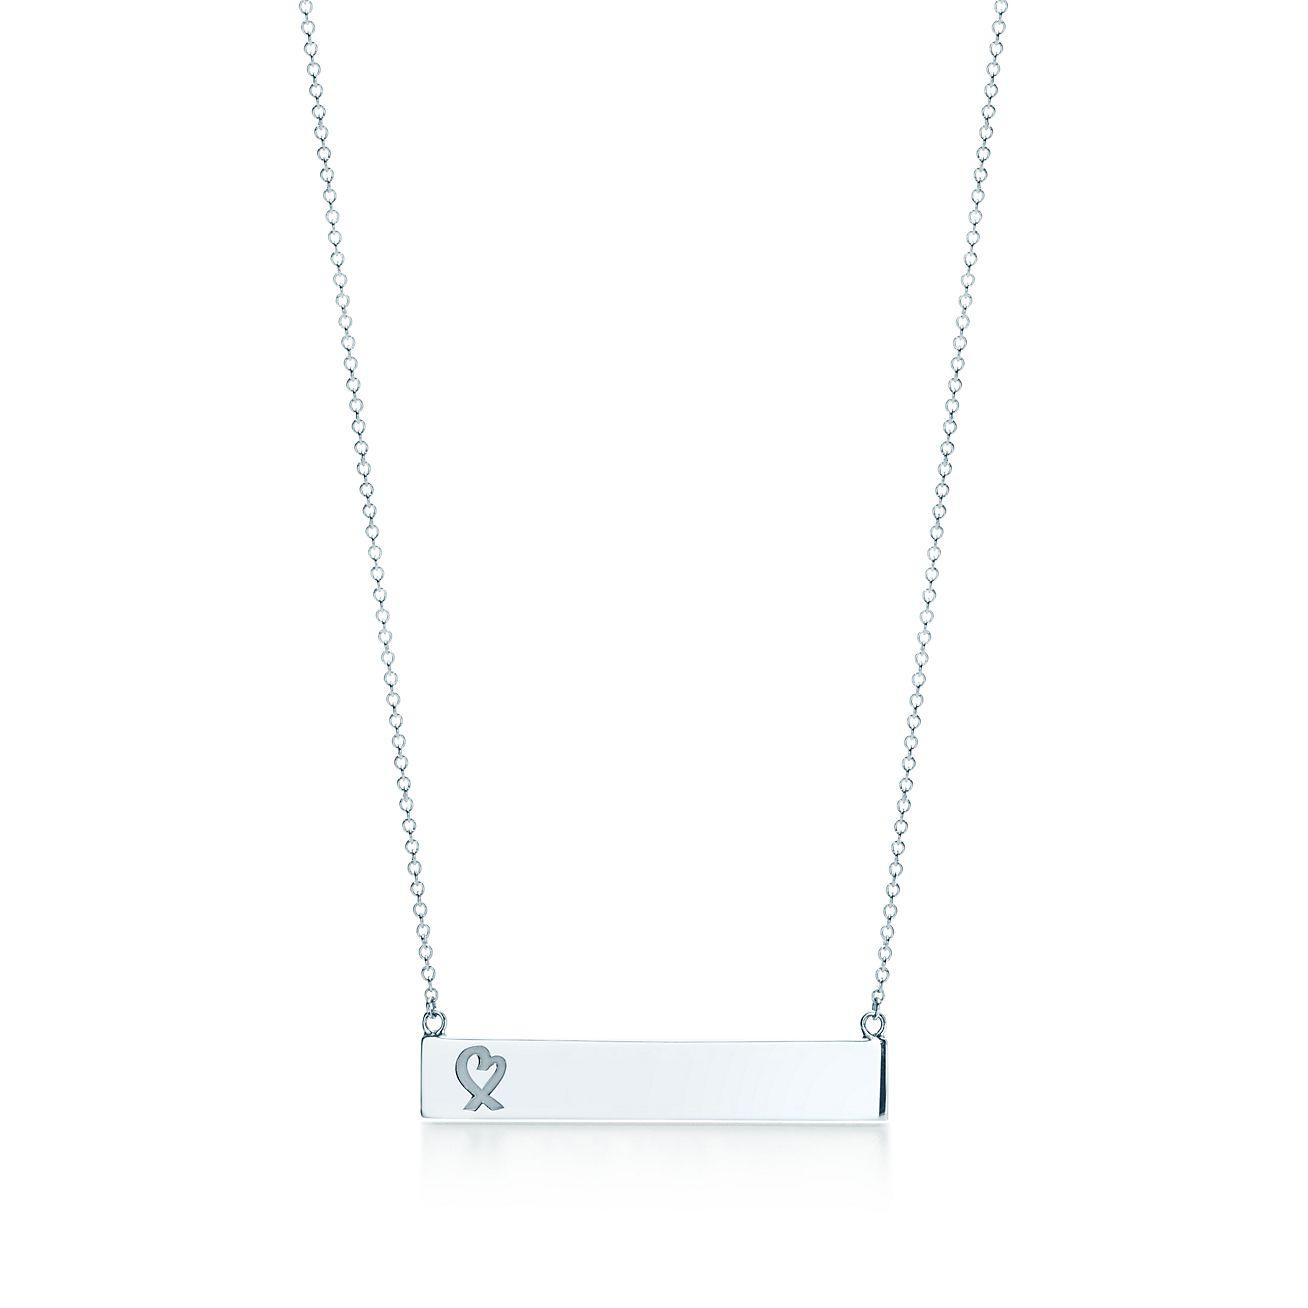 Paloma picasso loving heart bar pendant in sterling silver paloma picassoloving heart bar pendant aloadofball Gallery